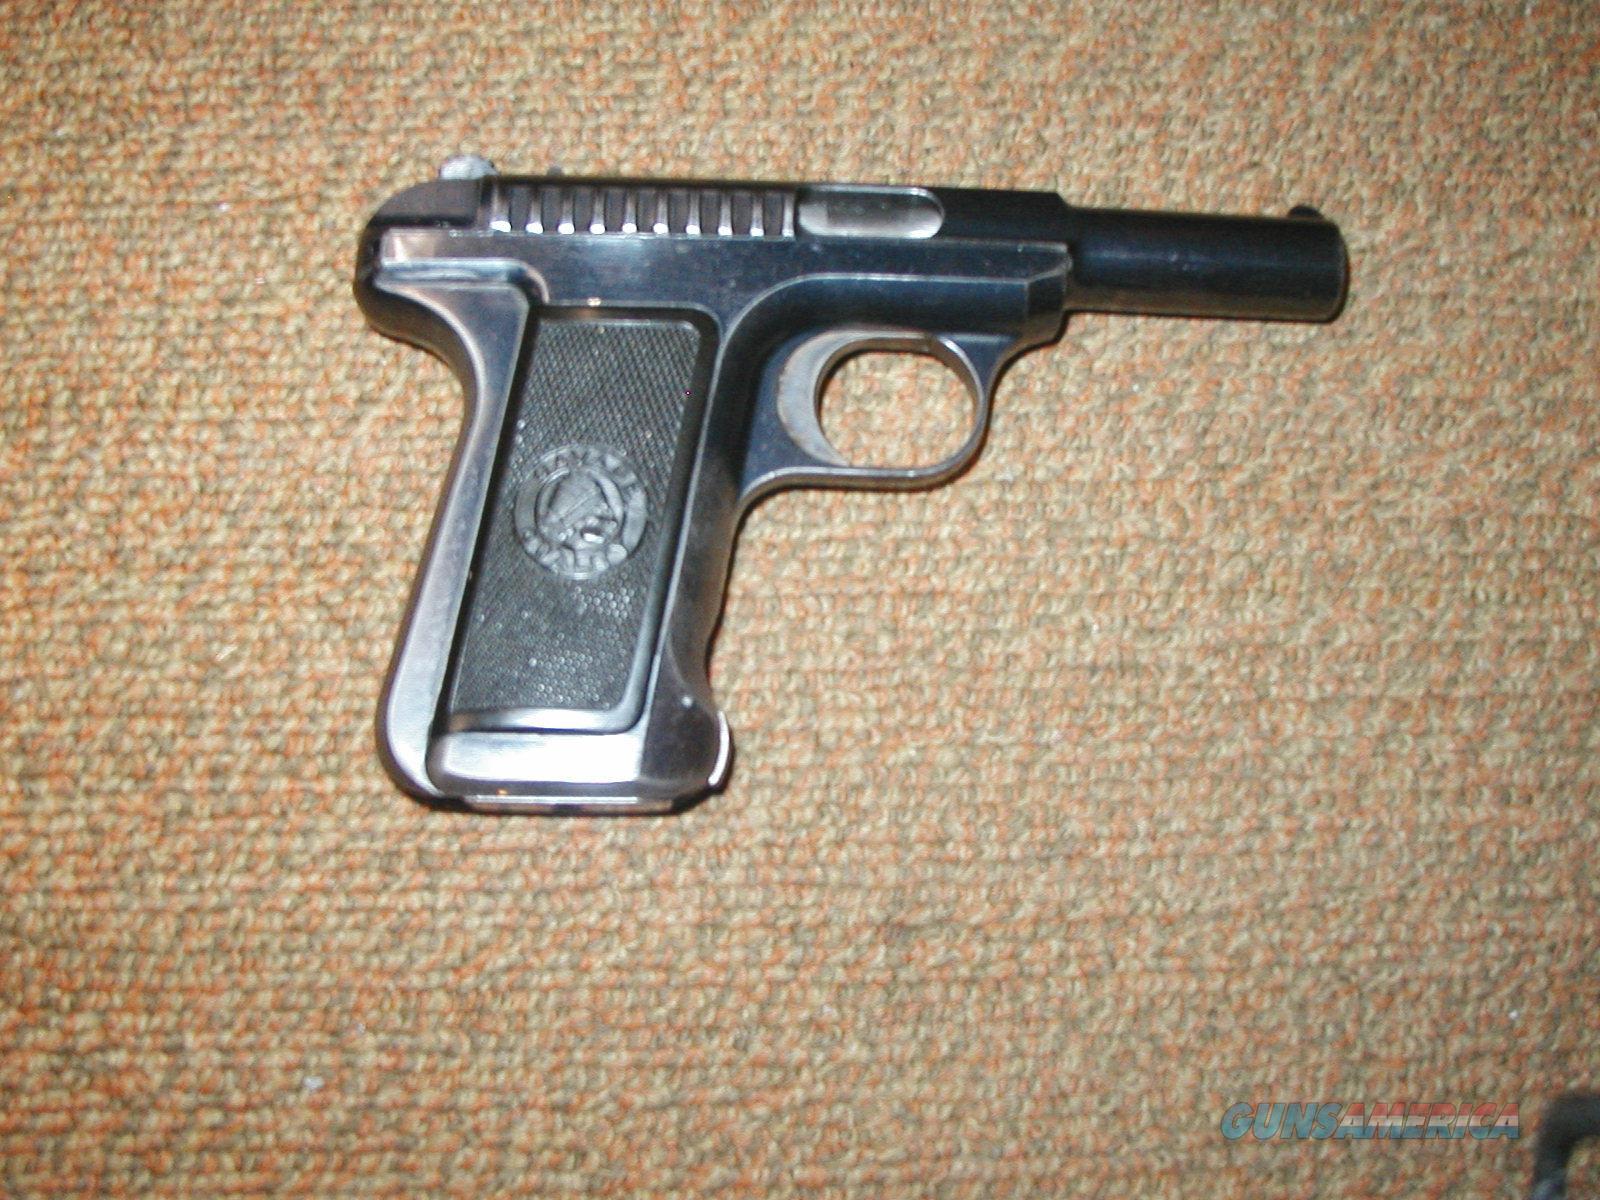 SAVAGE 1907 32ACP PISTOL MFG UTICA NY  Guns > Pistols > Savage Pistols